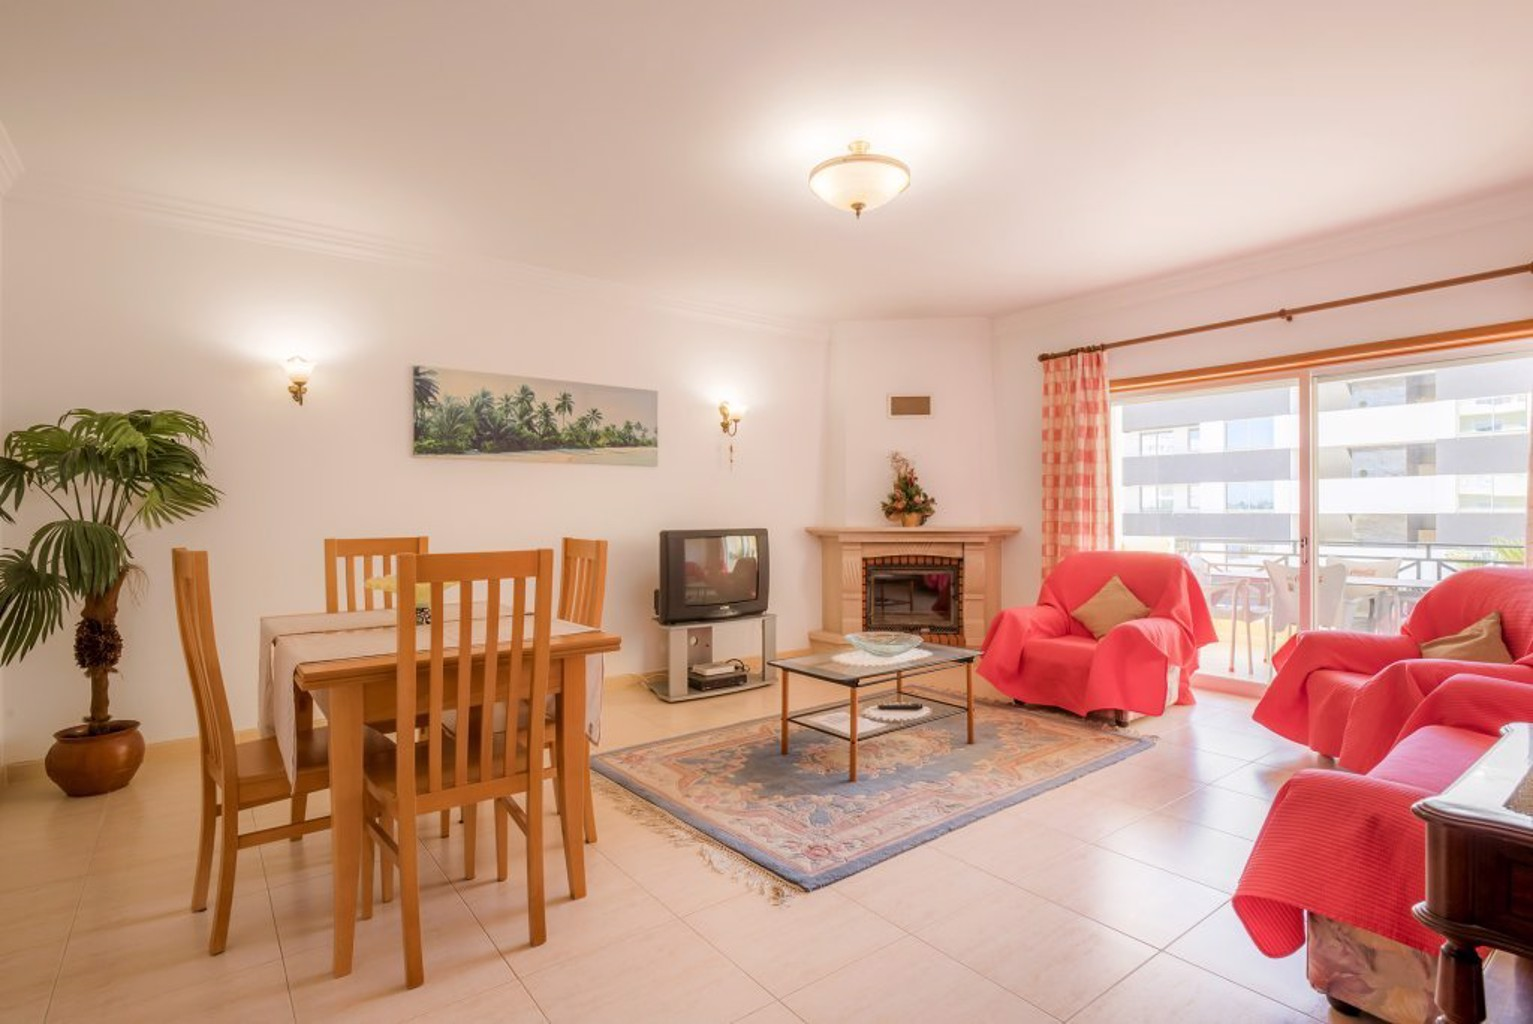 B37 Comfort Apartment in Lagos by DreamAlgarve